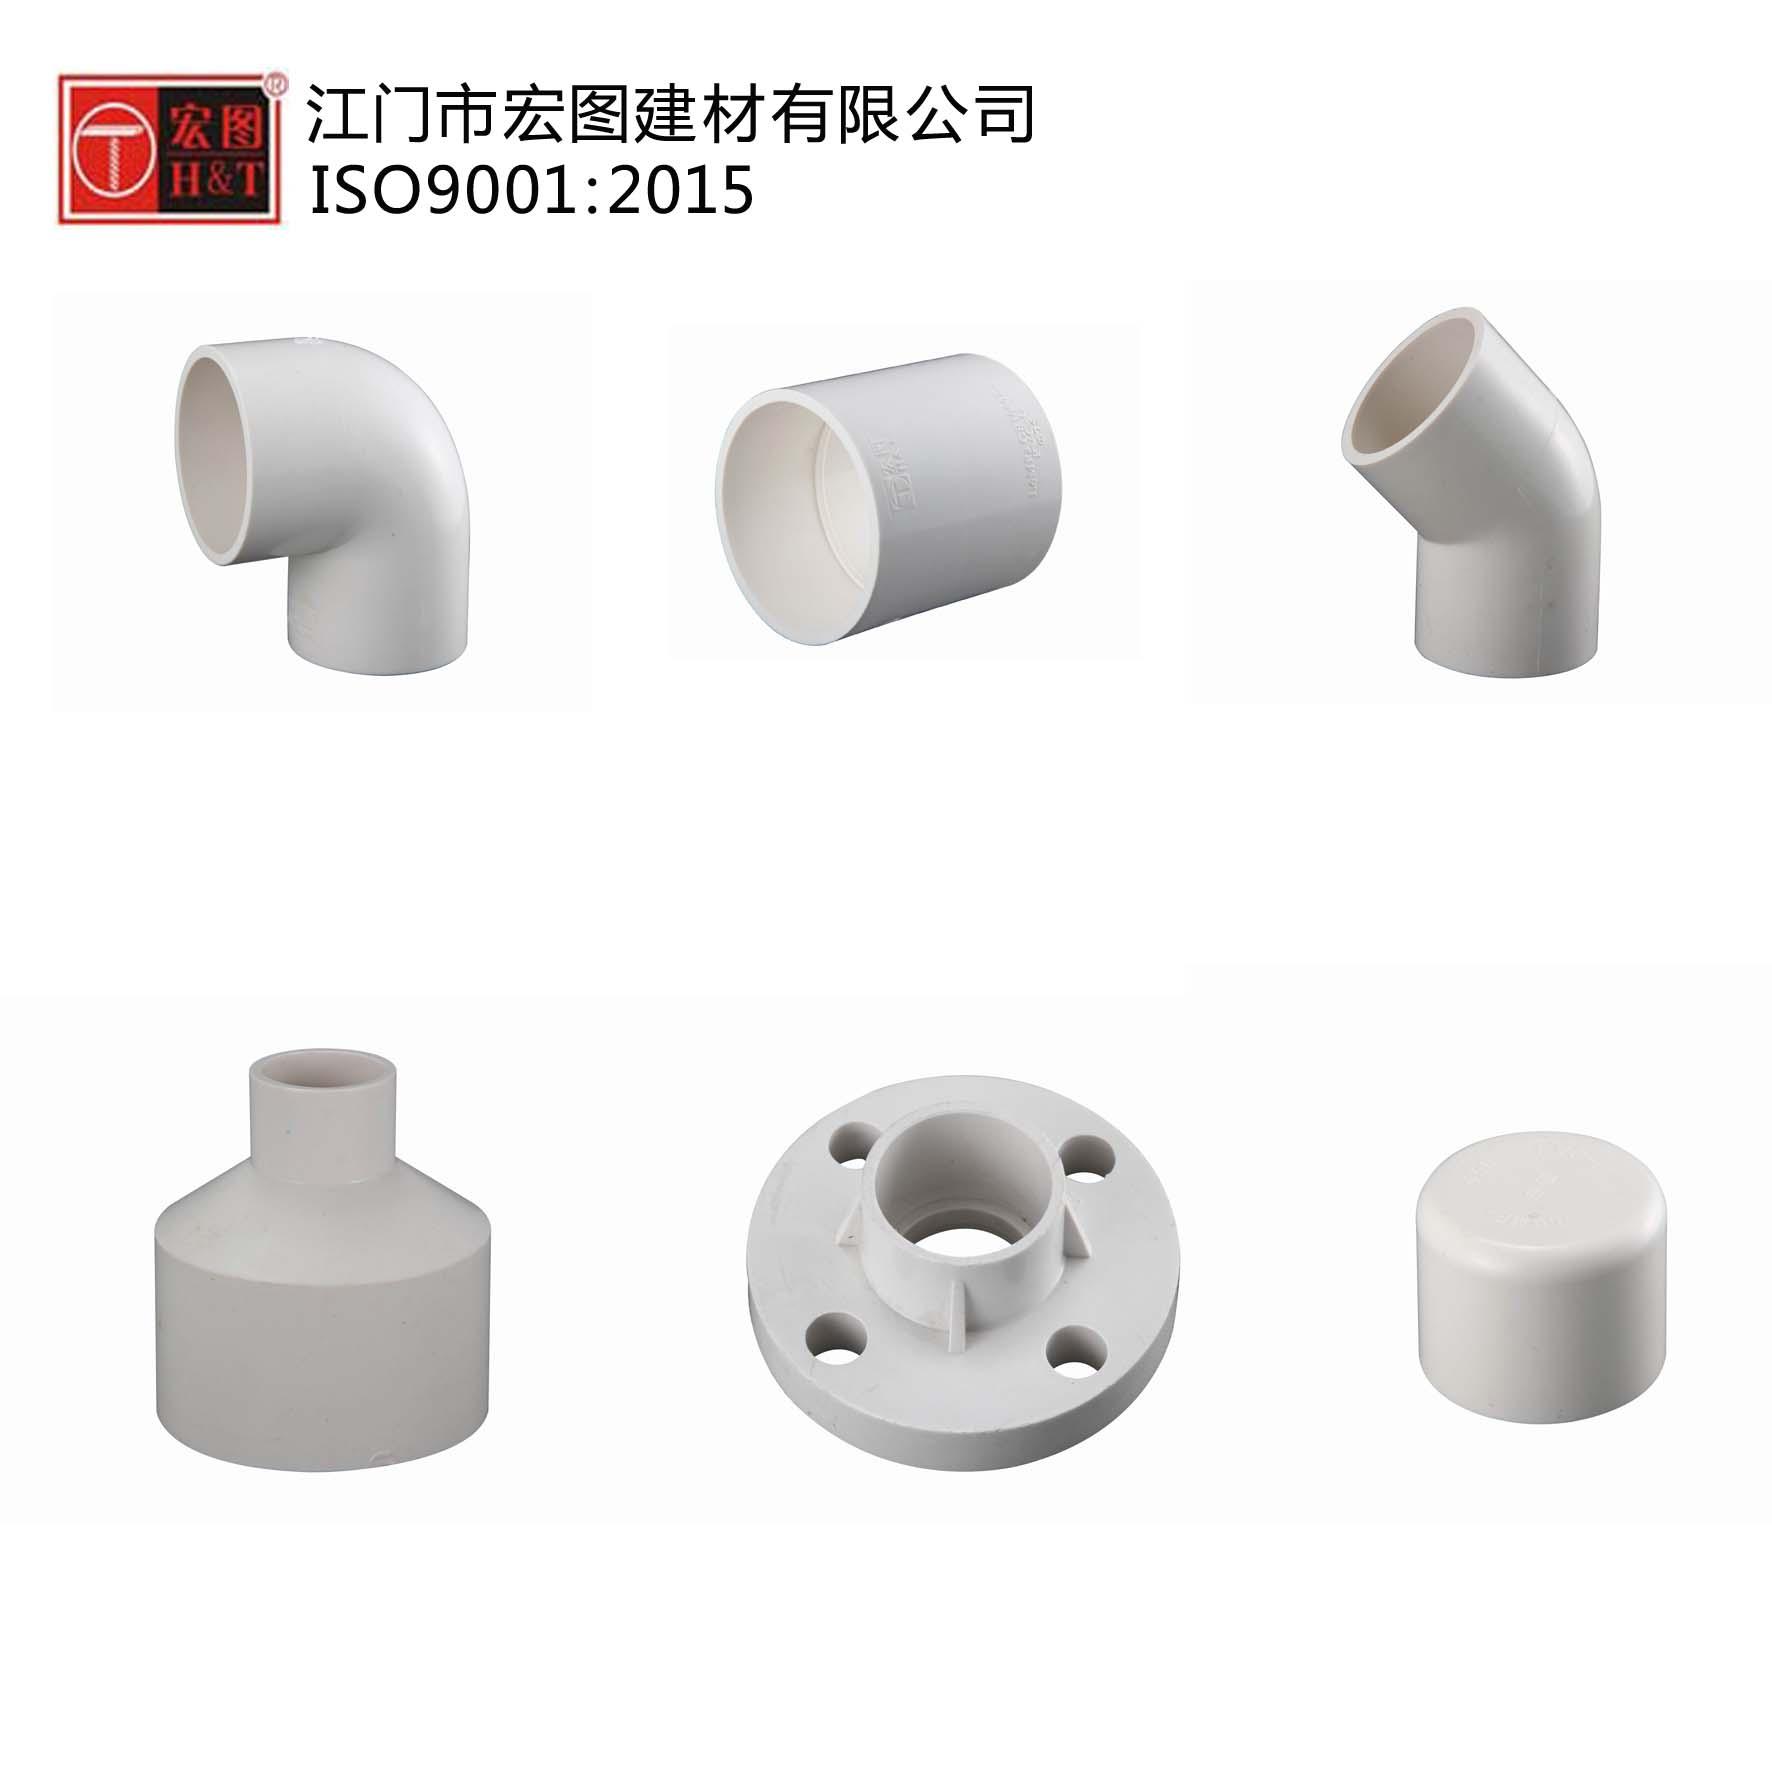 PVC-U 排水管配件